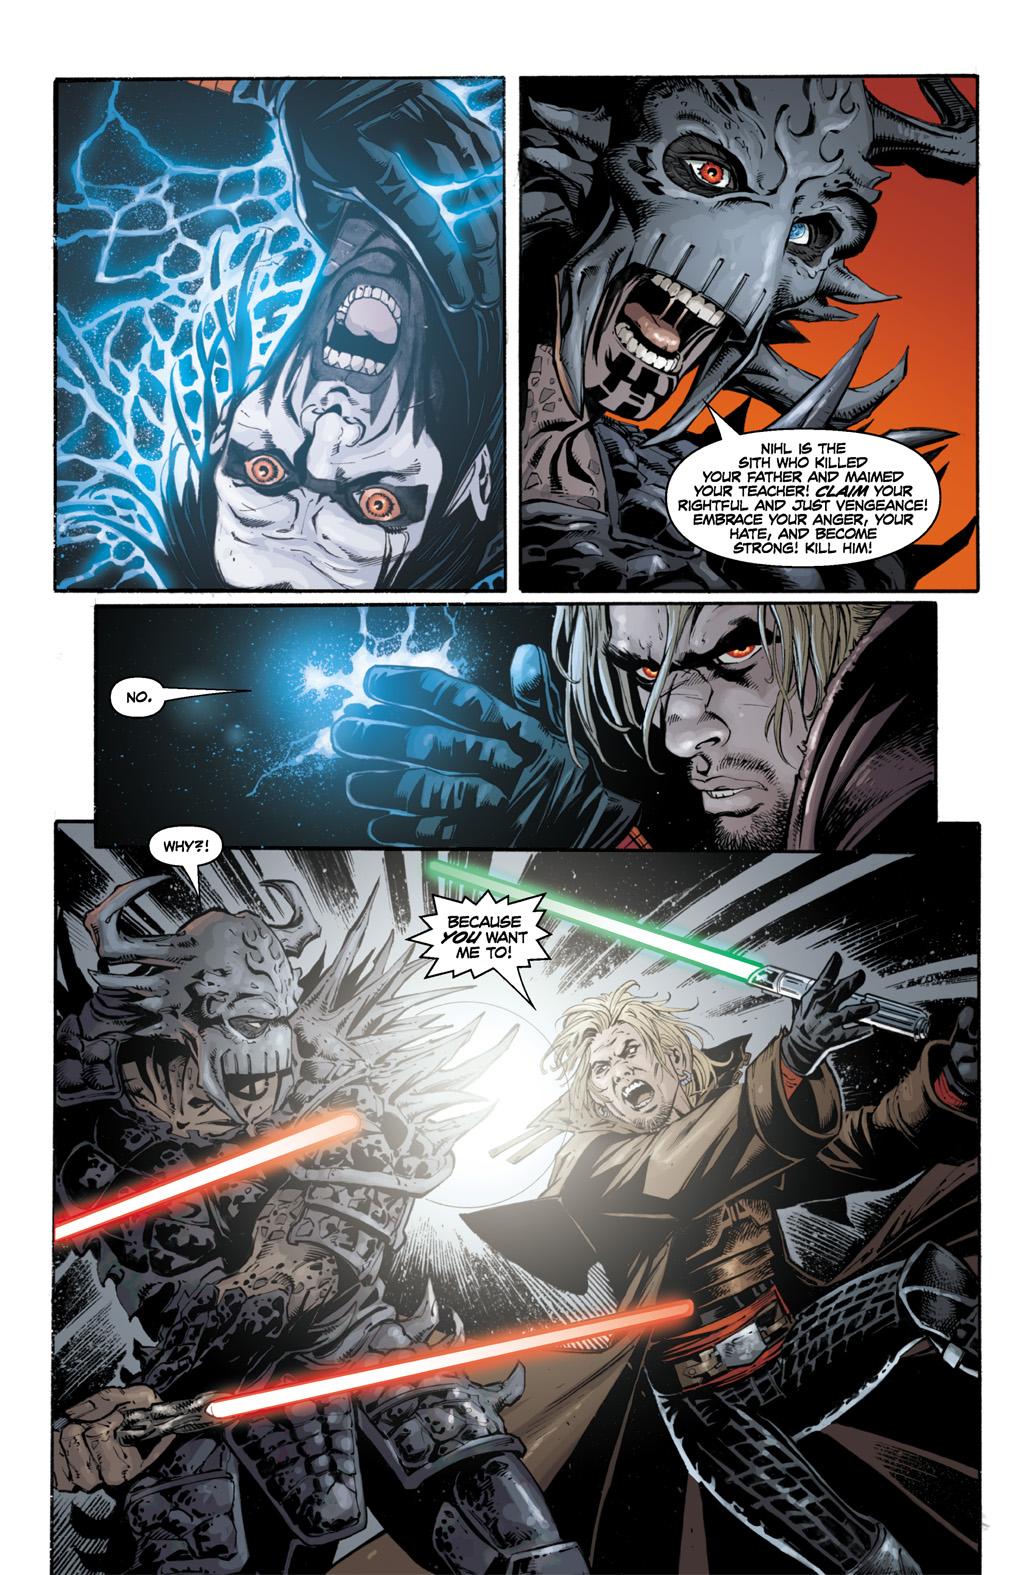 Comic-Only Fights Adapted To Novel Format FkL84_5ML20_US21FpuPVz55_a8PW4eZkRZ5wFLPFMHnkCH_YJ-lMlWGVP9NBAXvUjT-nEyAs0ba=s1600